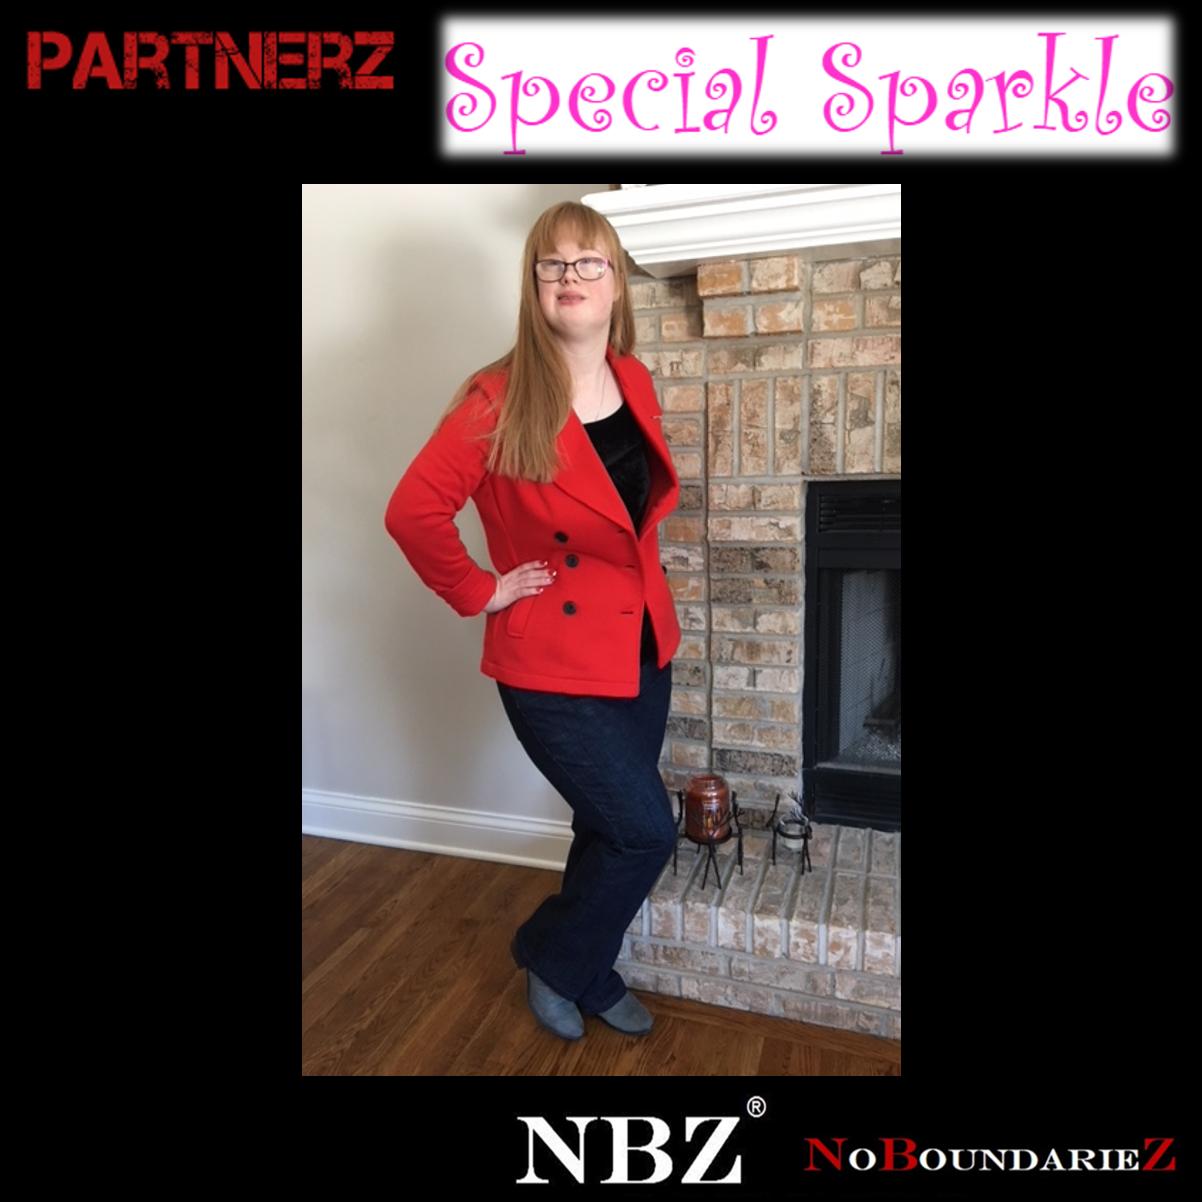 Special Sparkle NBZ